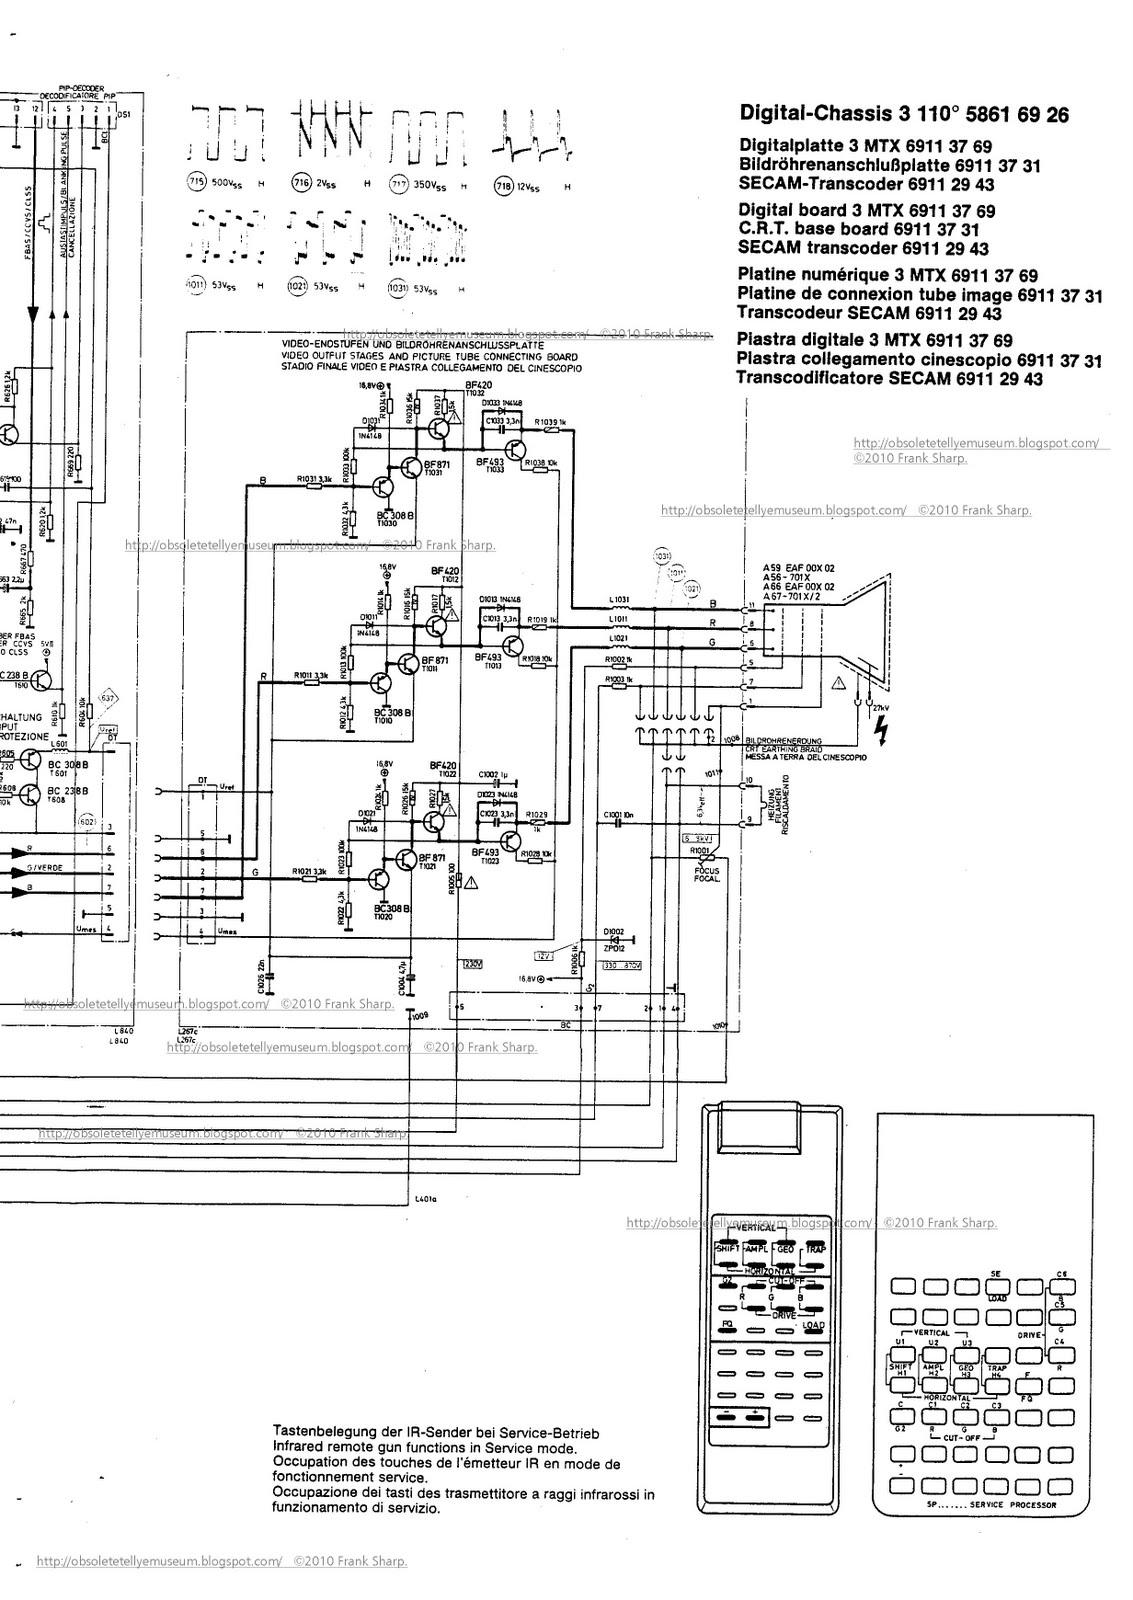 obsolete technology tellye    itt digivision 3486 oscar chassis digi 3 90 u00b0 fst crt tube itt